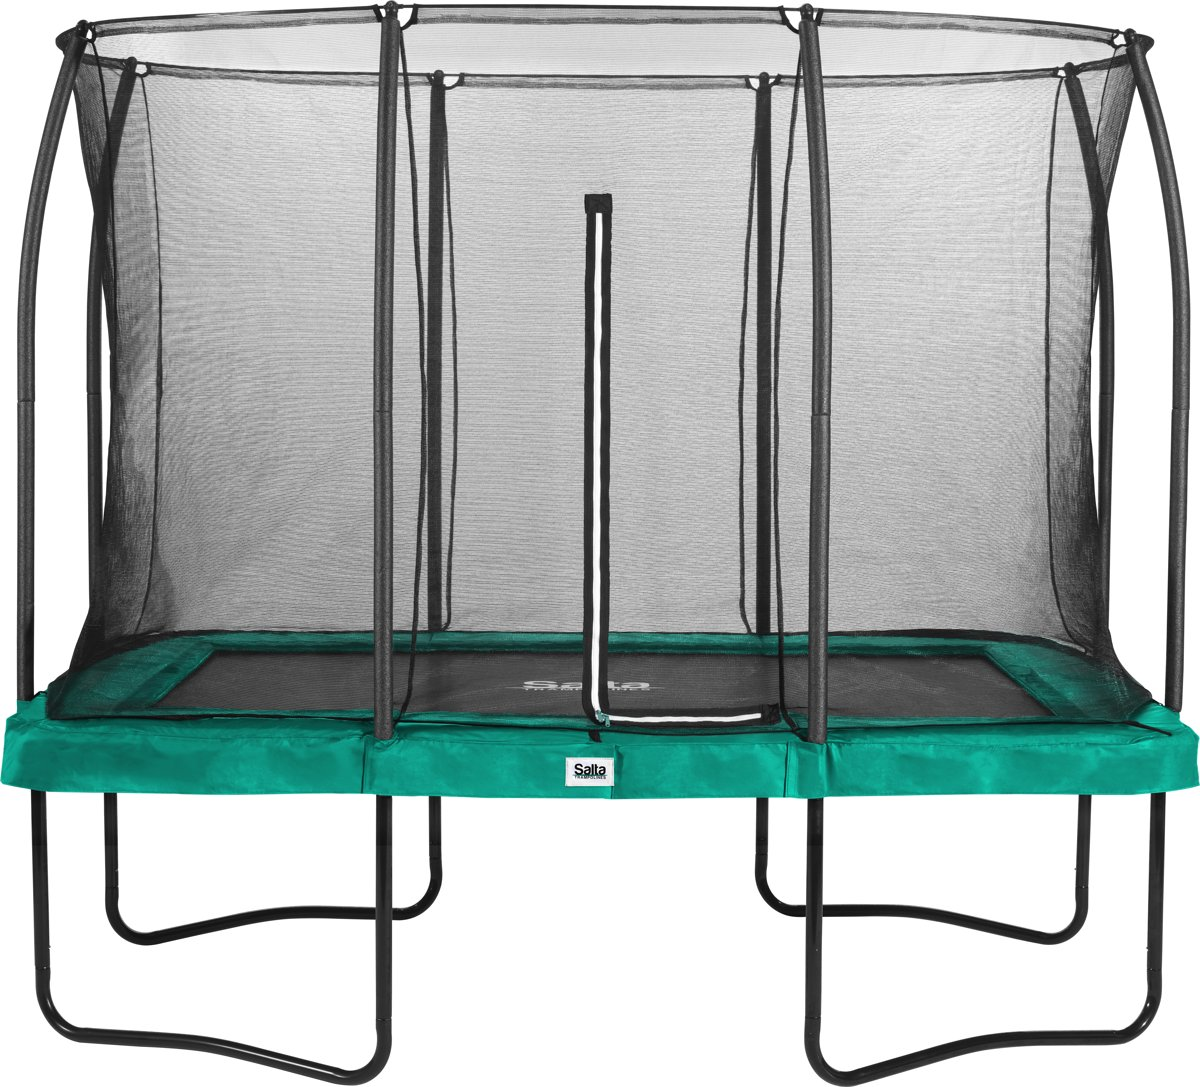 Salta Comfort Edition 214x305cm - Green